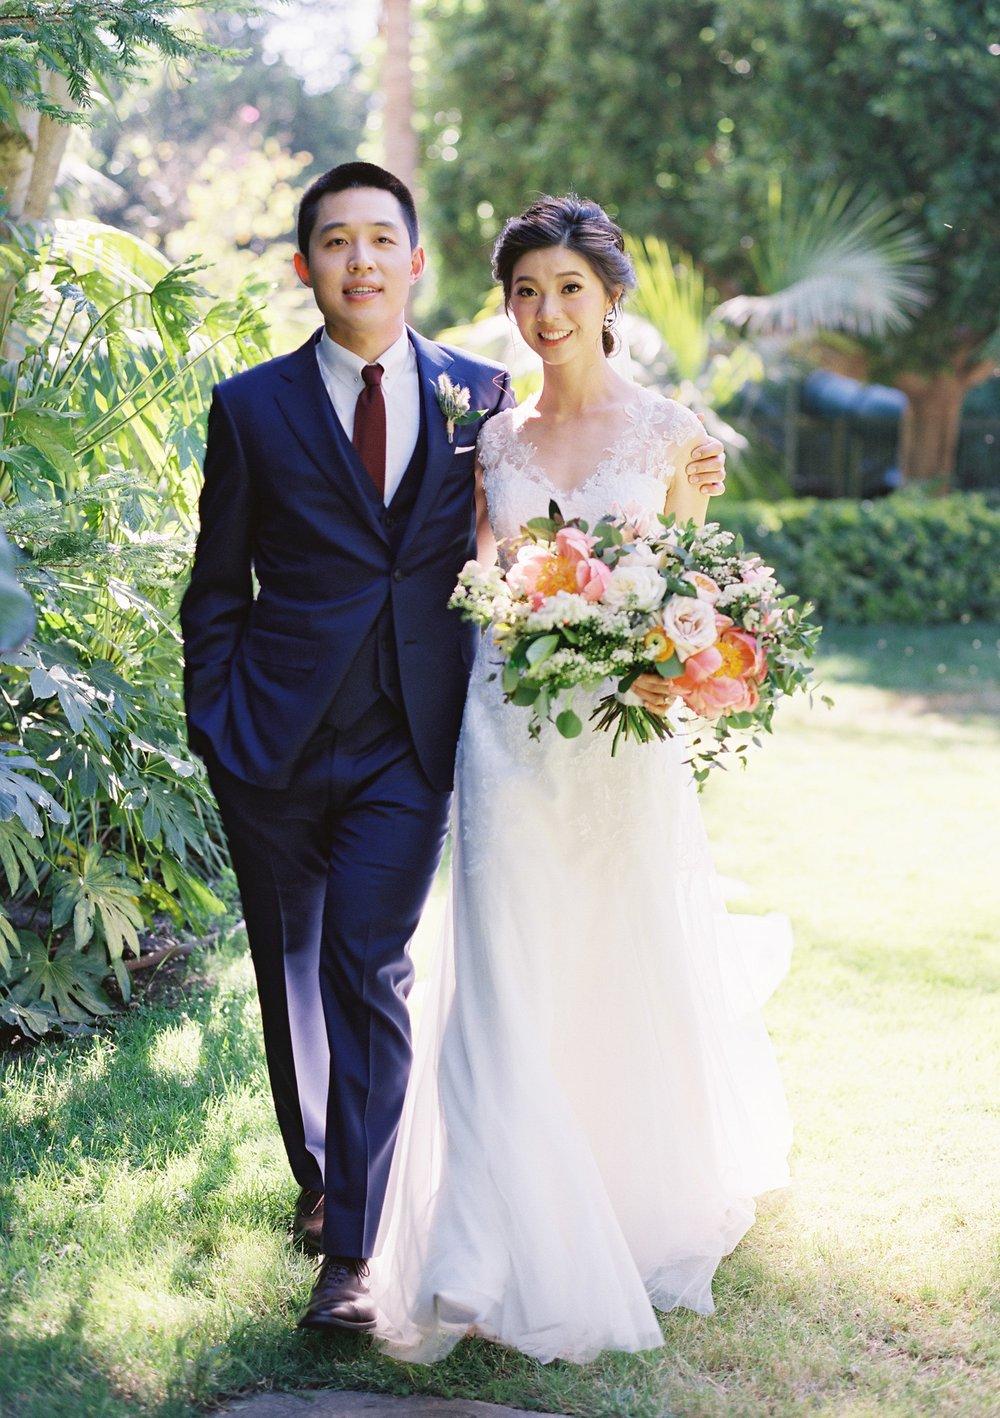 Jenn-Albert-Editorial-High-Res-65-Jen-Huang-007317-R1-016.jpg